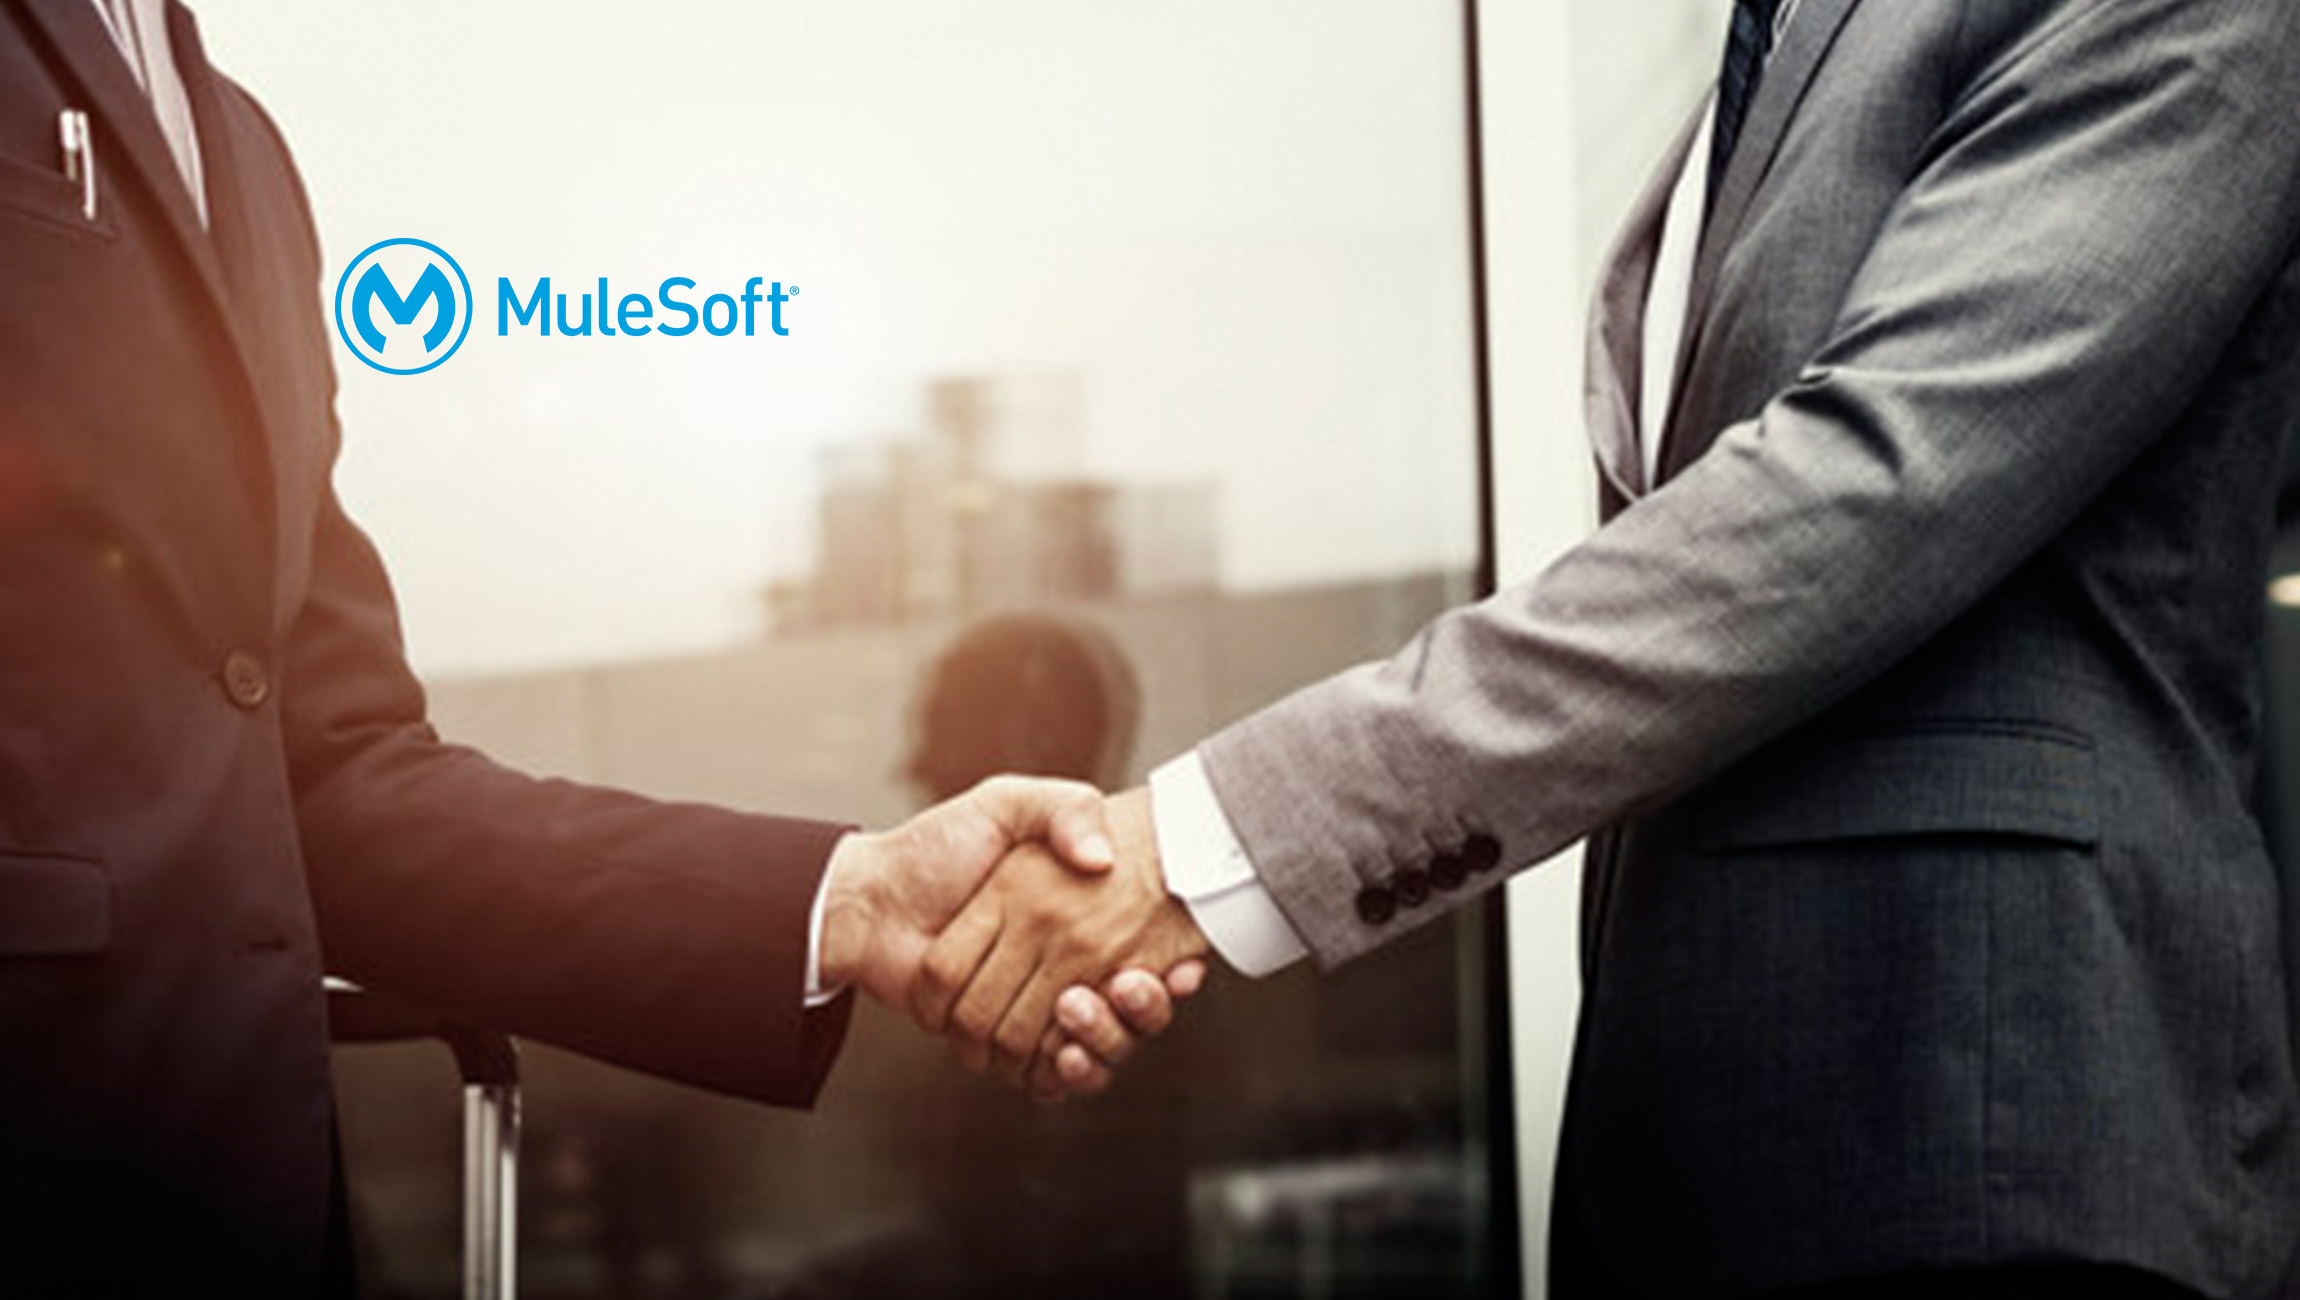 Ipswitch Joins the MuleSoft Technology Partner Program